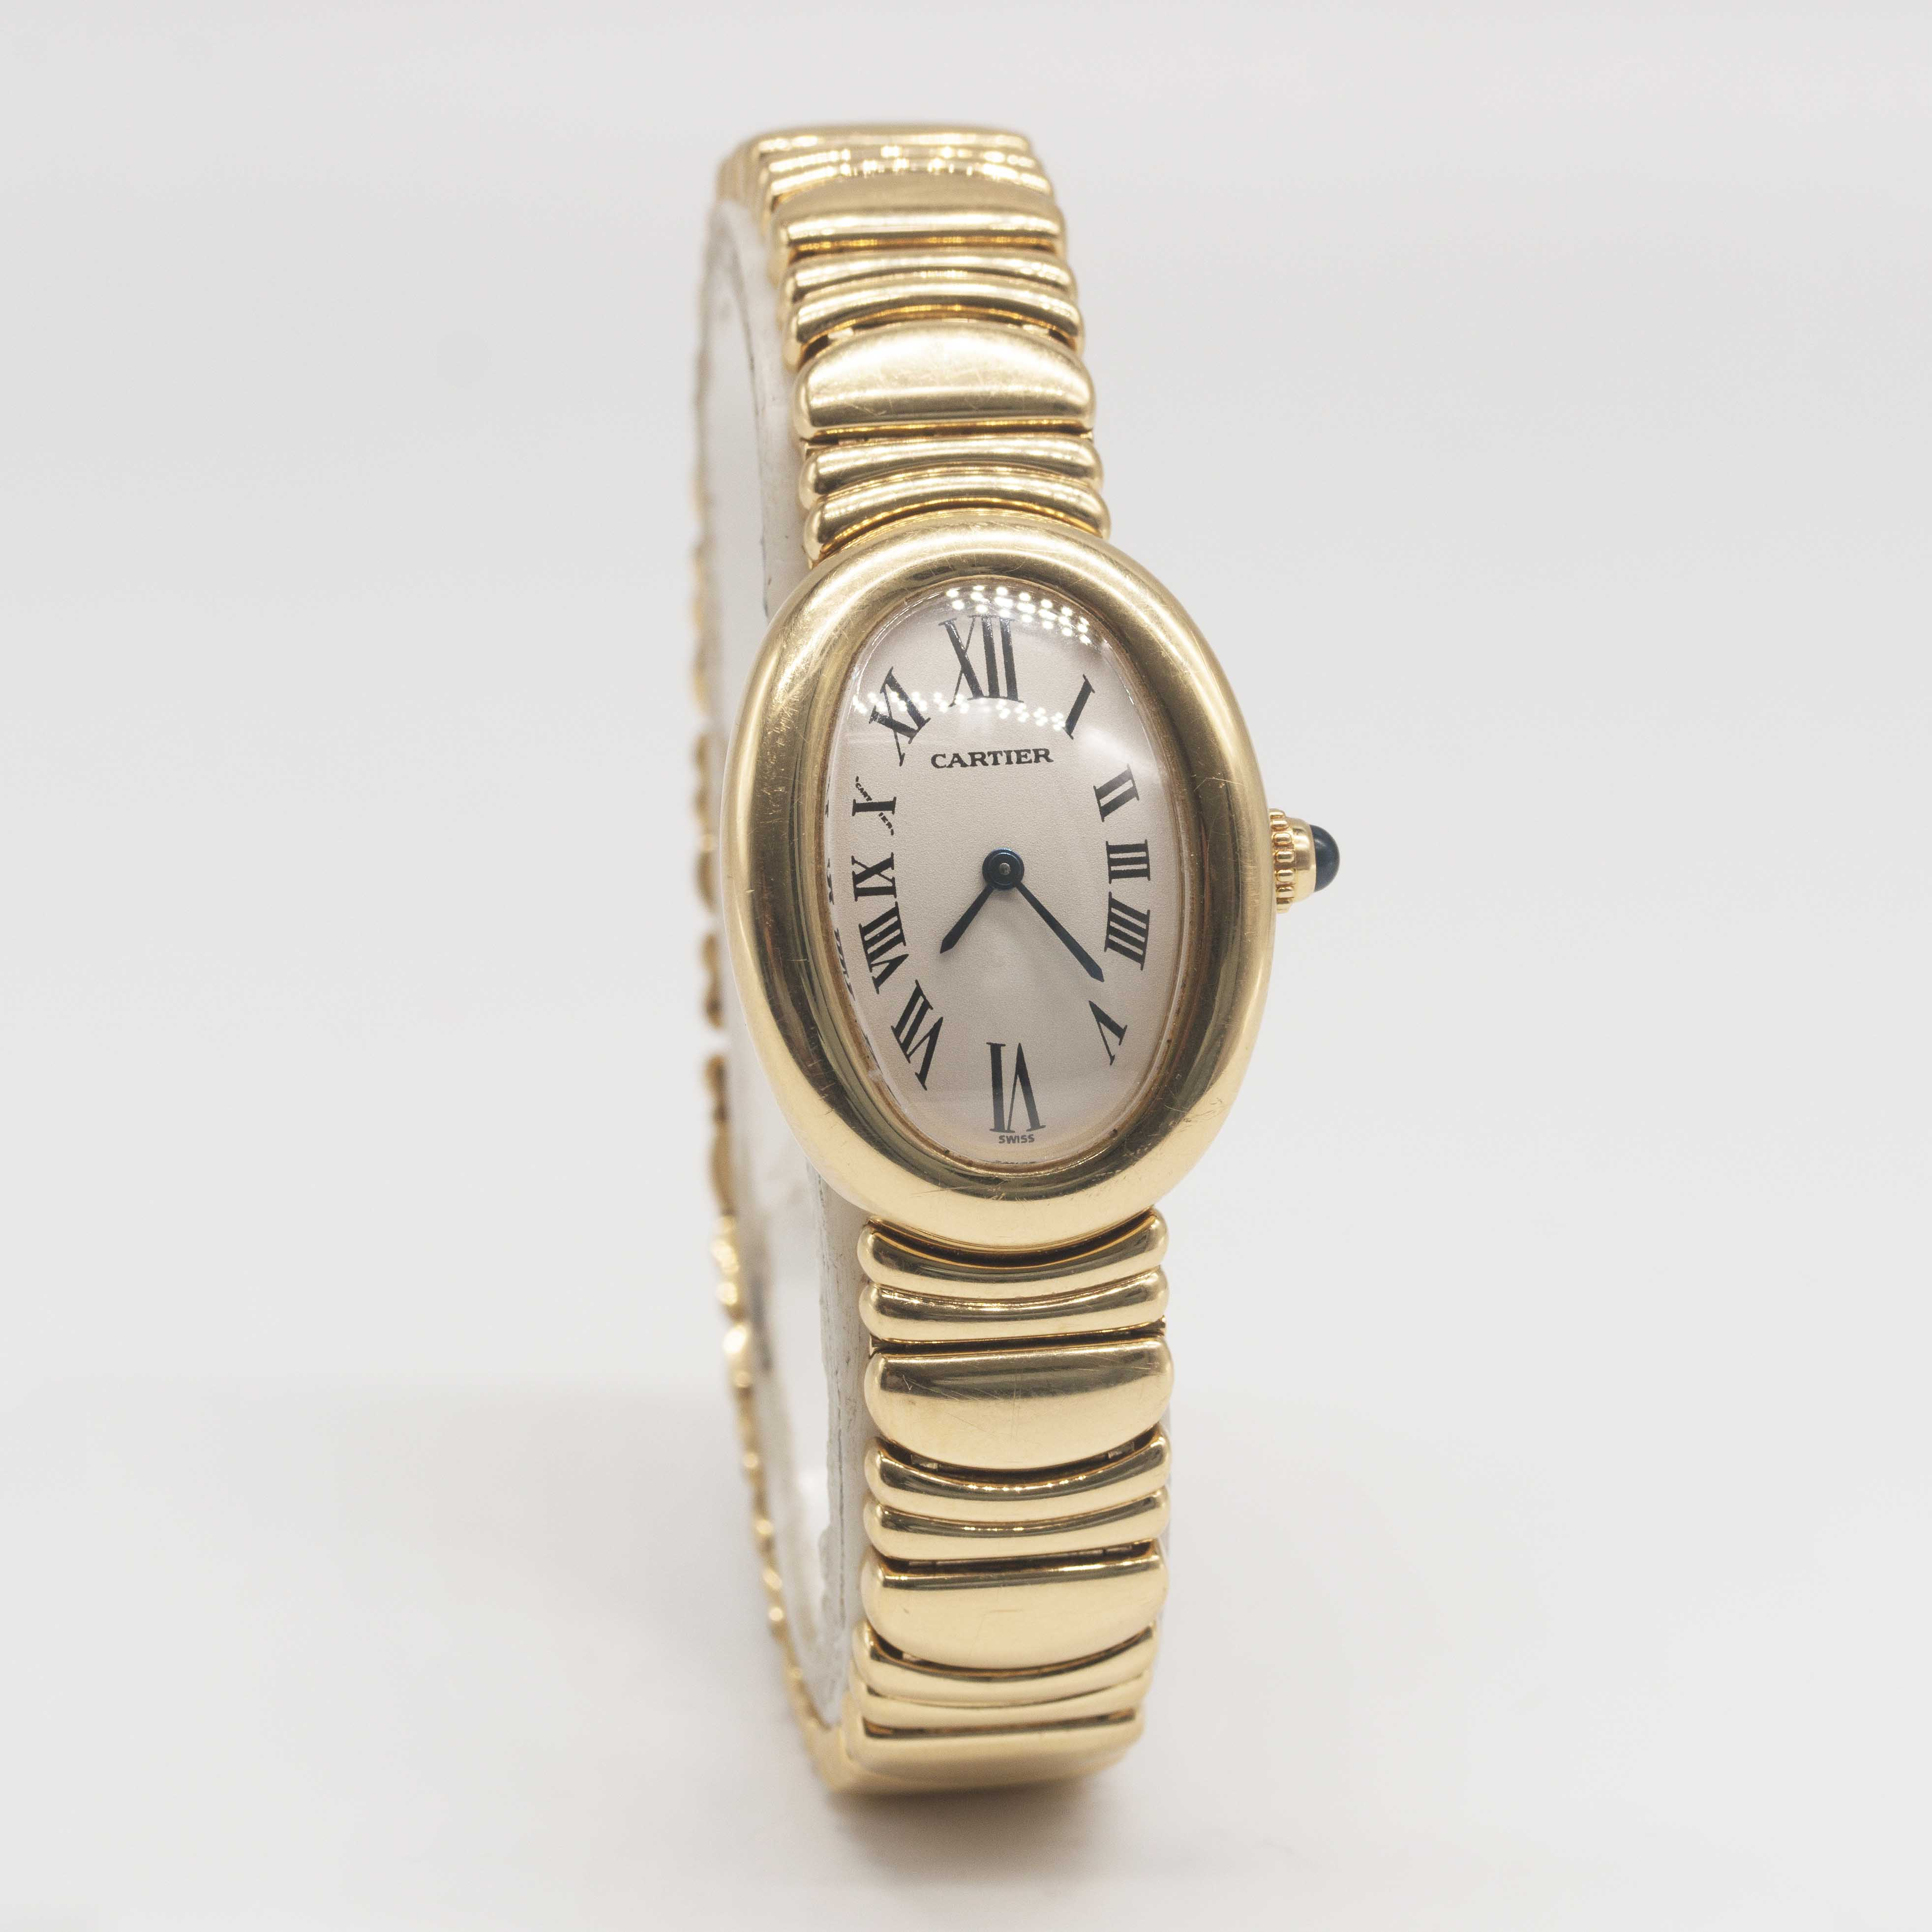 Lot 12 - A LADIES 18K SOLID YELLOW GOLD CARTIER BAIGNOIRE BRACELETWATCH CIRCA 1990s, REF. 1954 Movement: